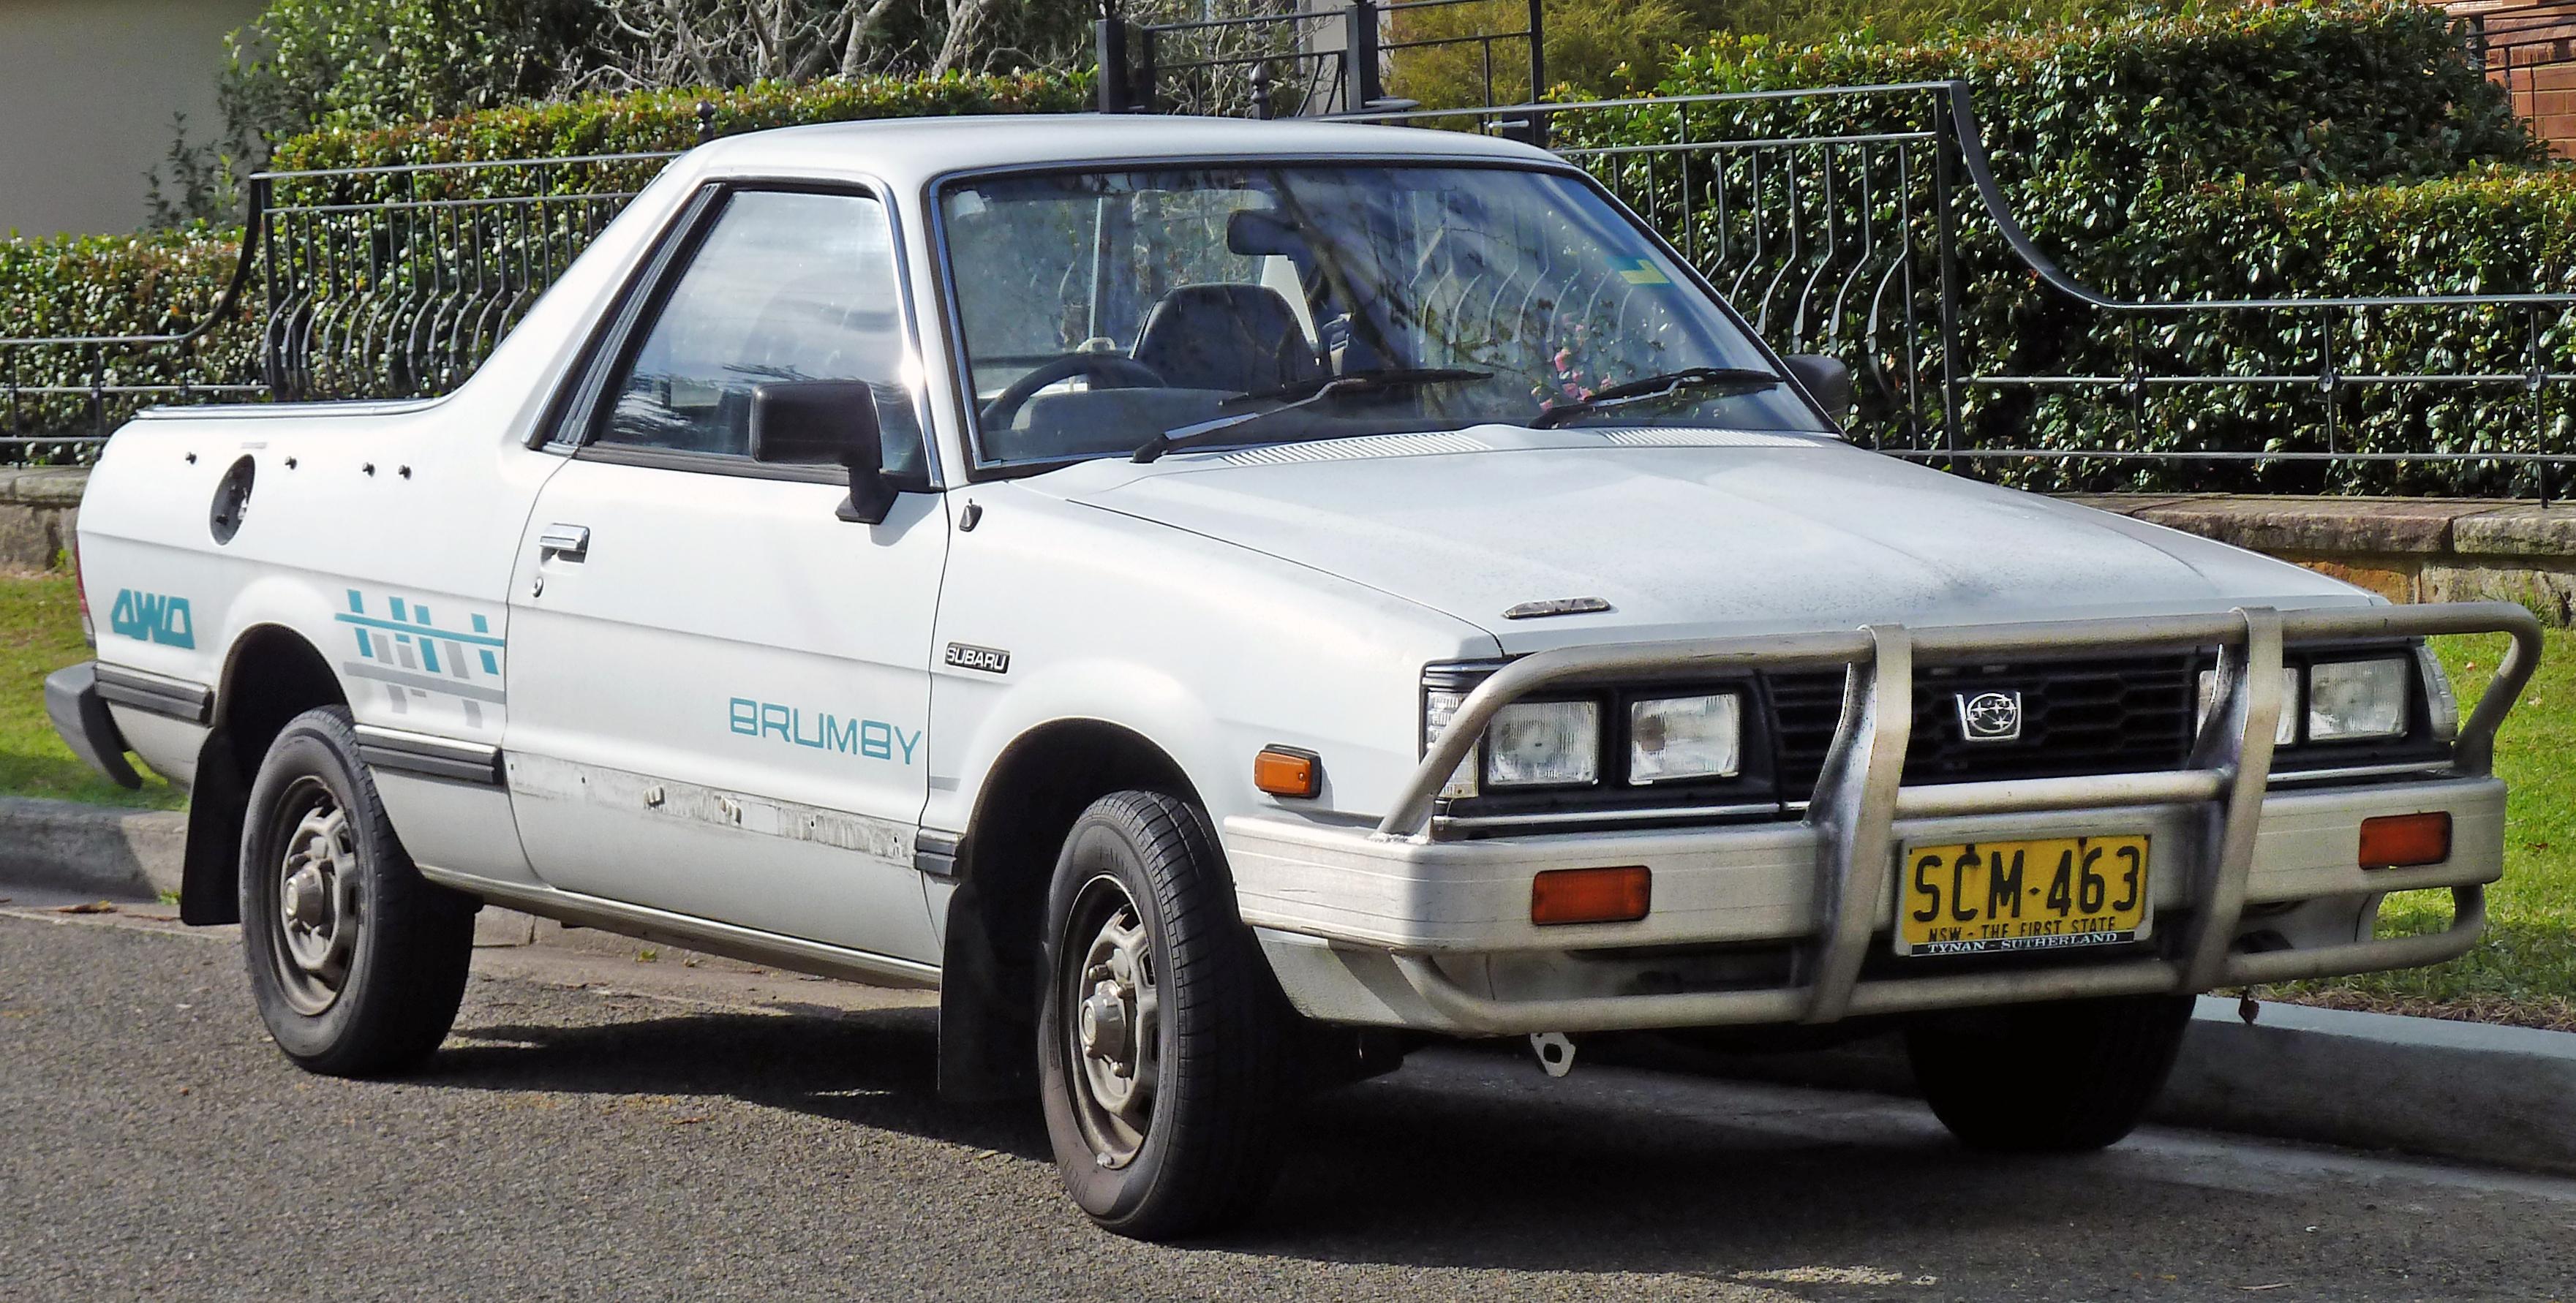 File 1991 Subaru Brumby Utility 2010 07 21 01 Jpg